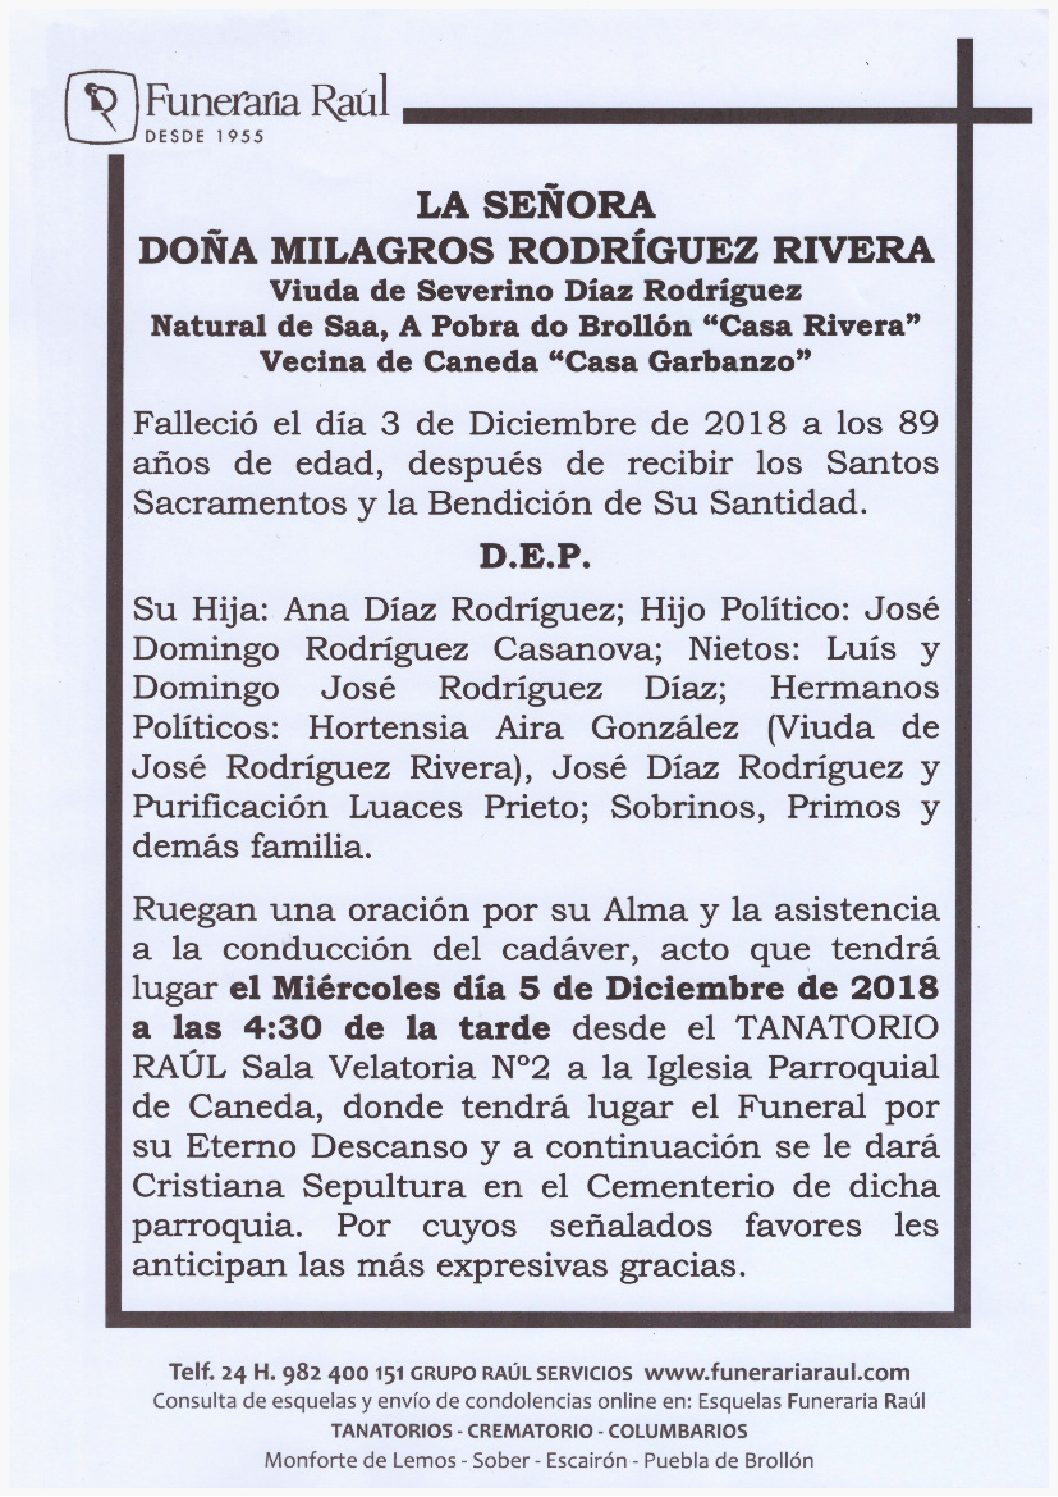 DOÑA MILAGROS RODRIGUEZ RIVERA